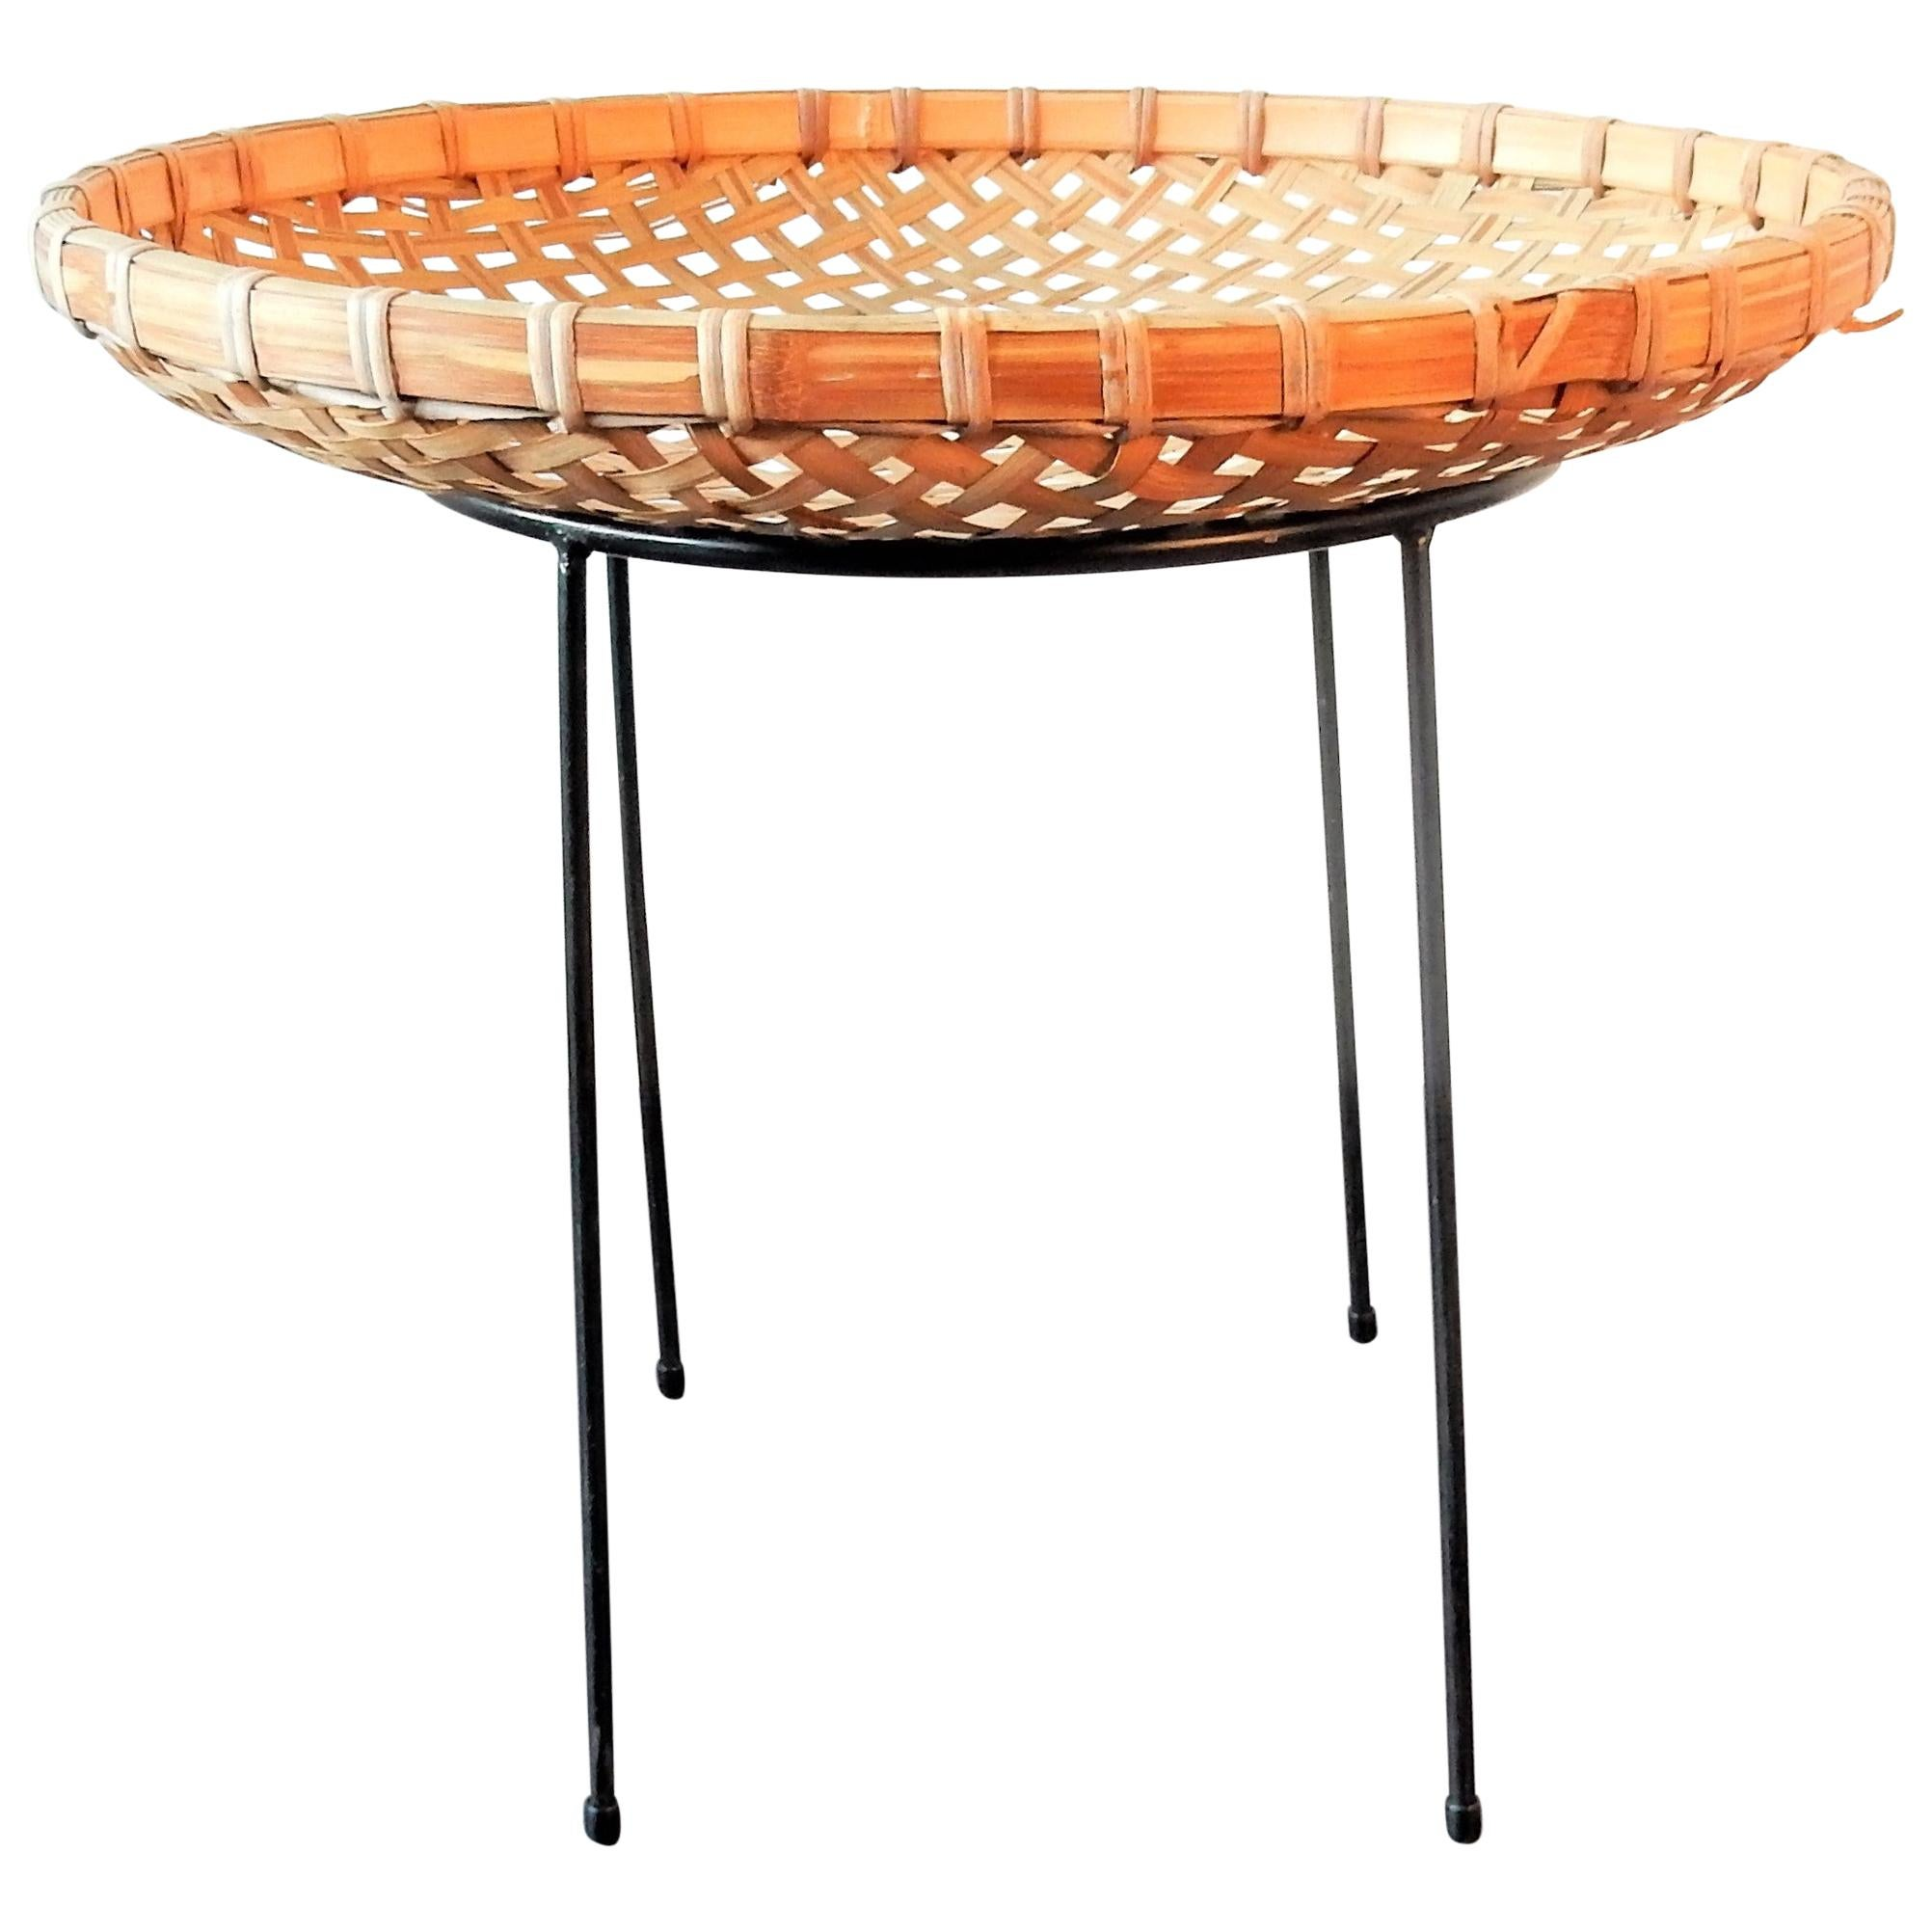 Rattan Bamboo Magazine Basket Stand by Artimeta, the Netherlands 1960s